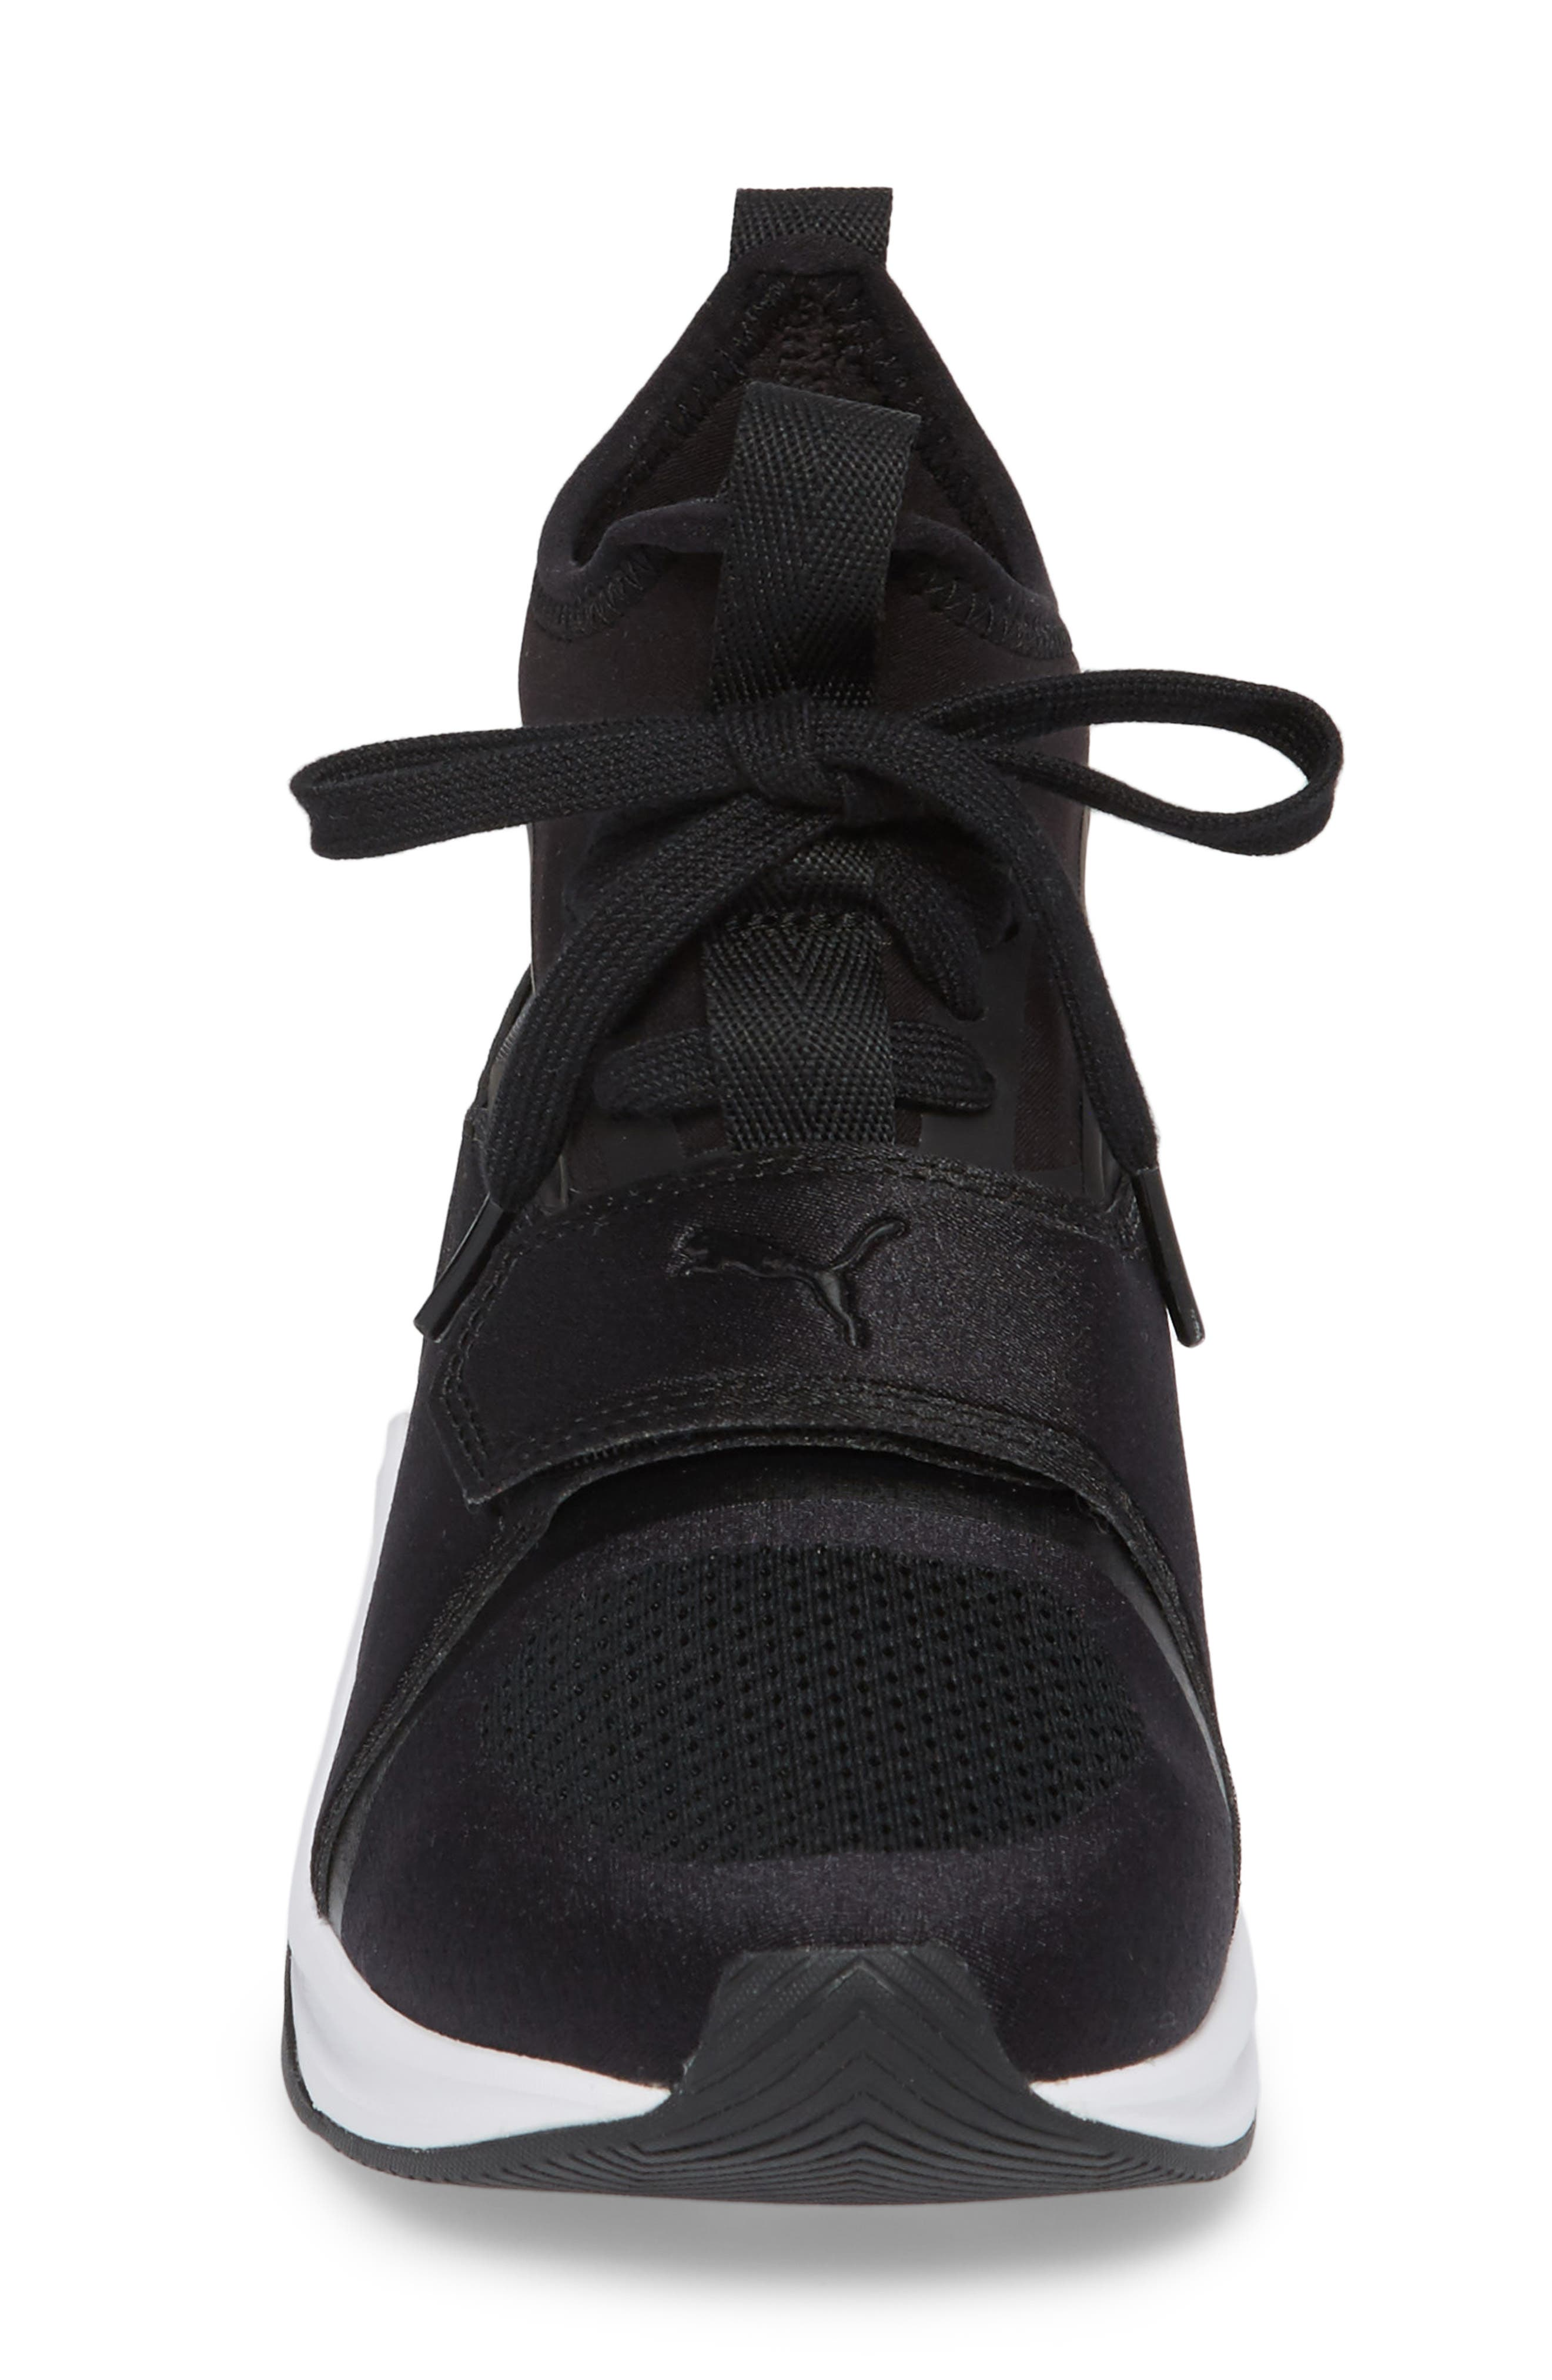 Phenom Jr High Top Sneaker,                             Alternate thumbnail 4, color,                             001